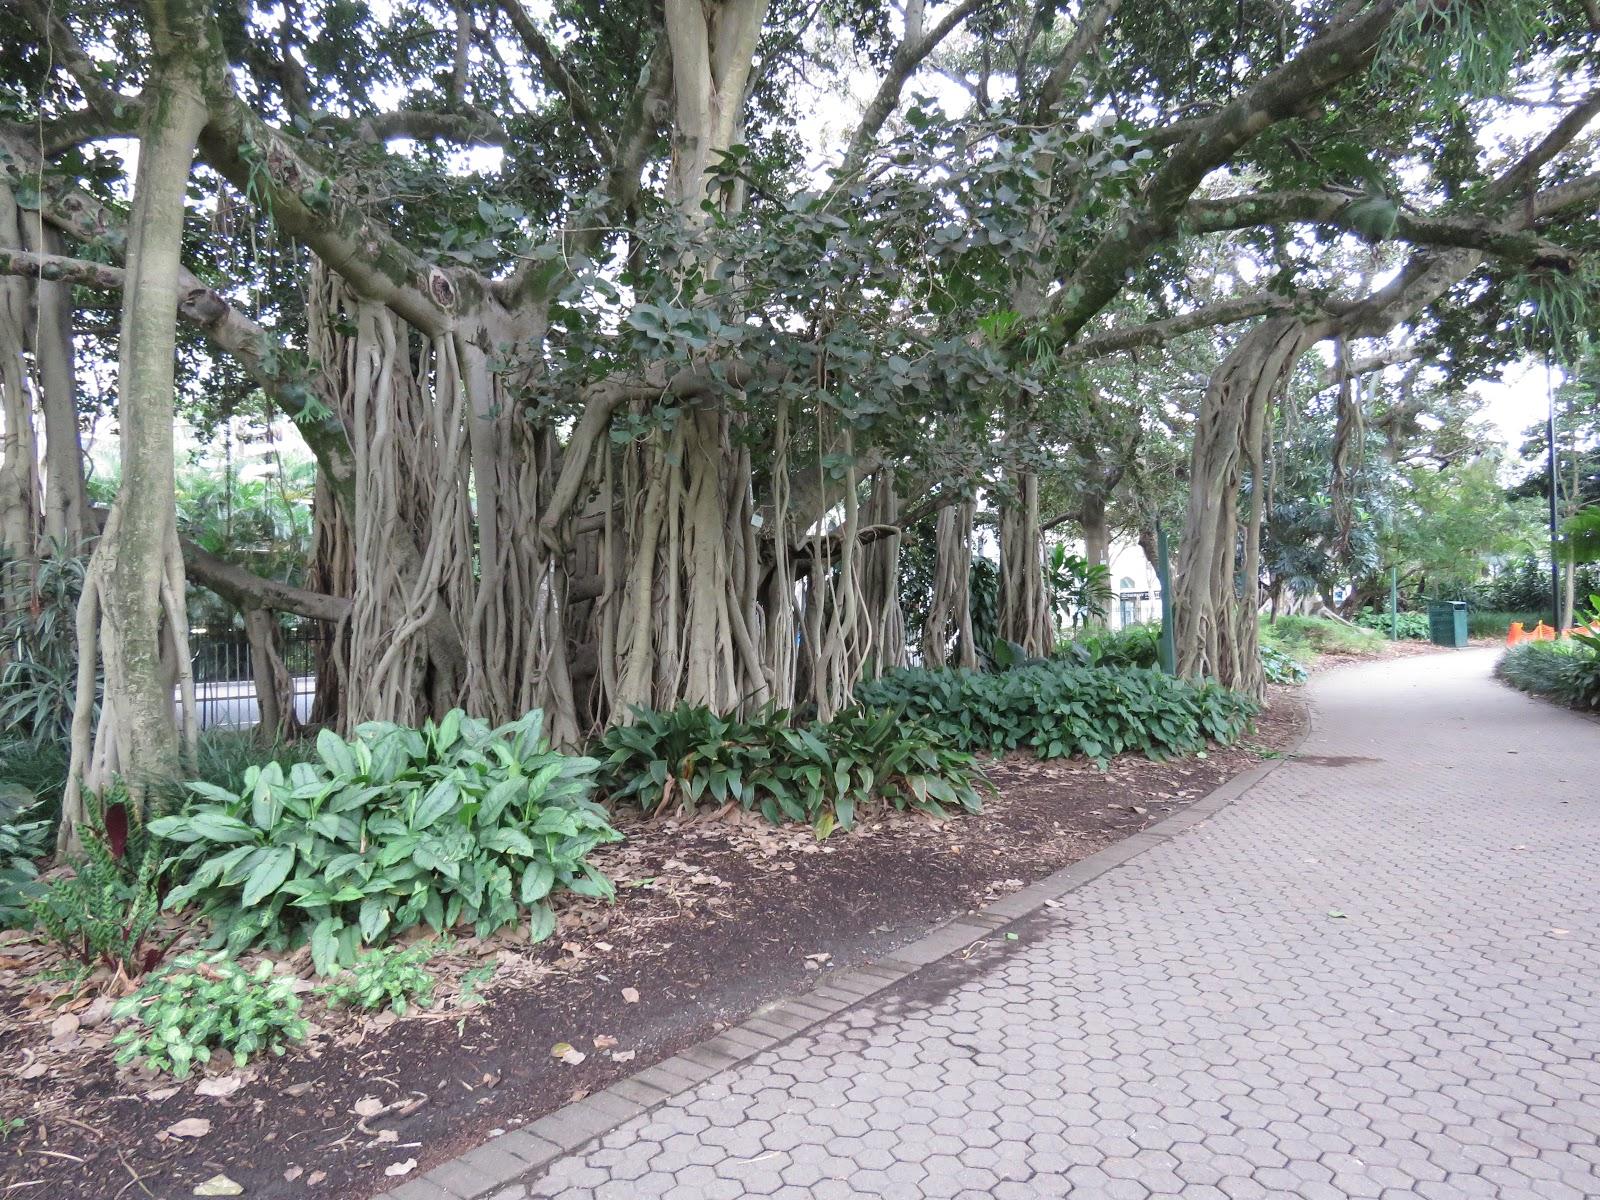 BANYAN FIG TREE, CITY BOTANIC GARDENS, BRISBANE, QUEENSLAND, AUSTRALIA